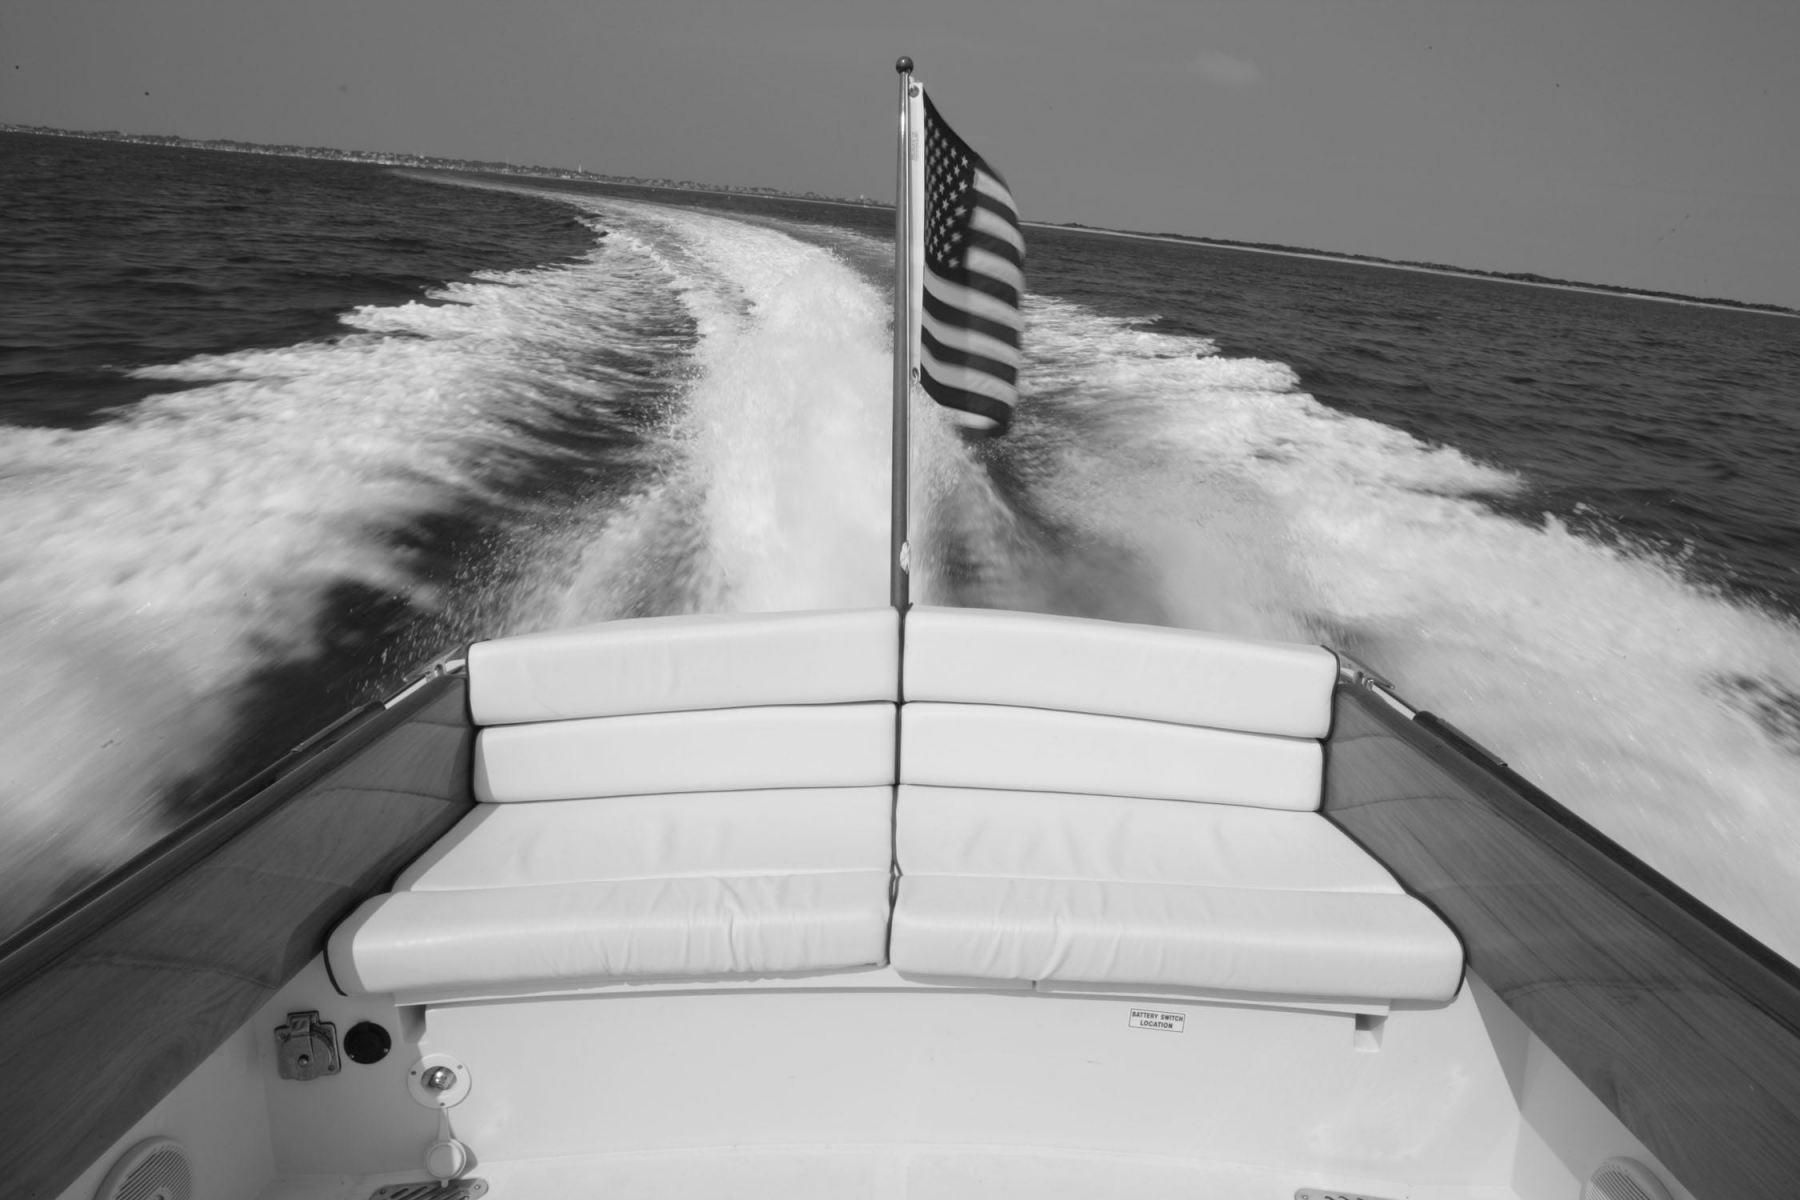 Doug's Boat, 2006